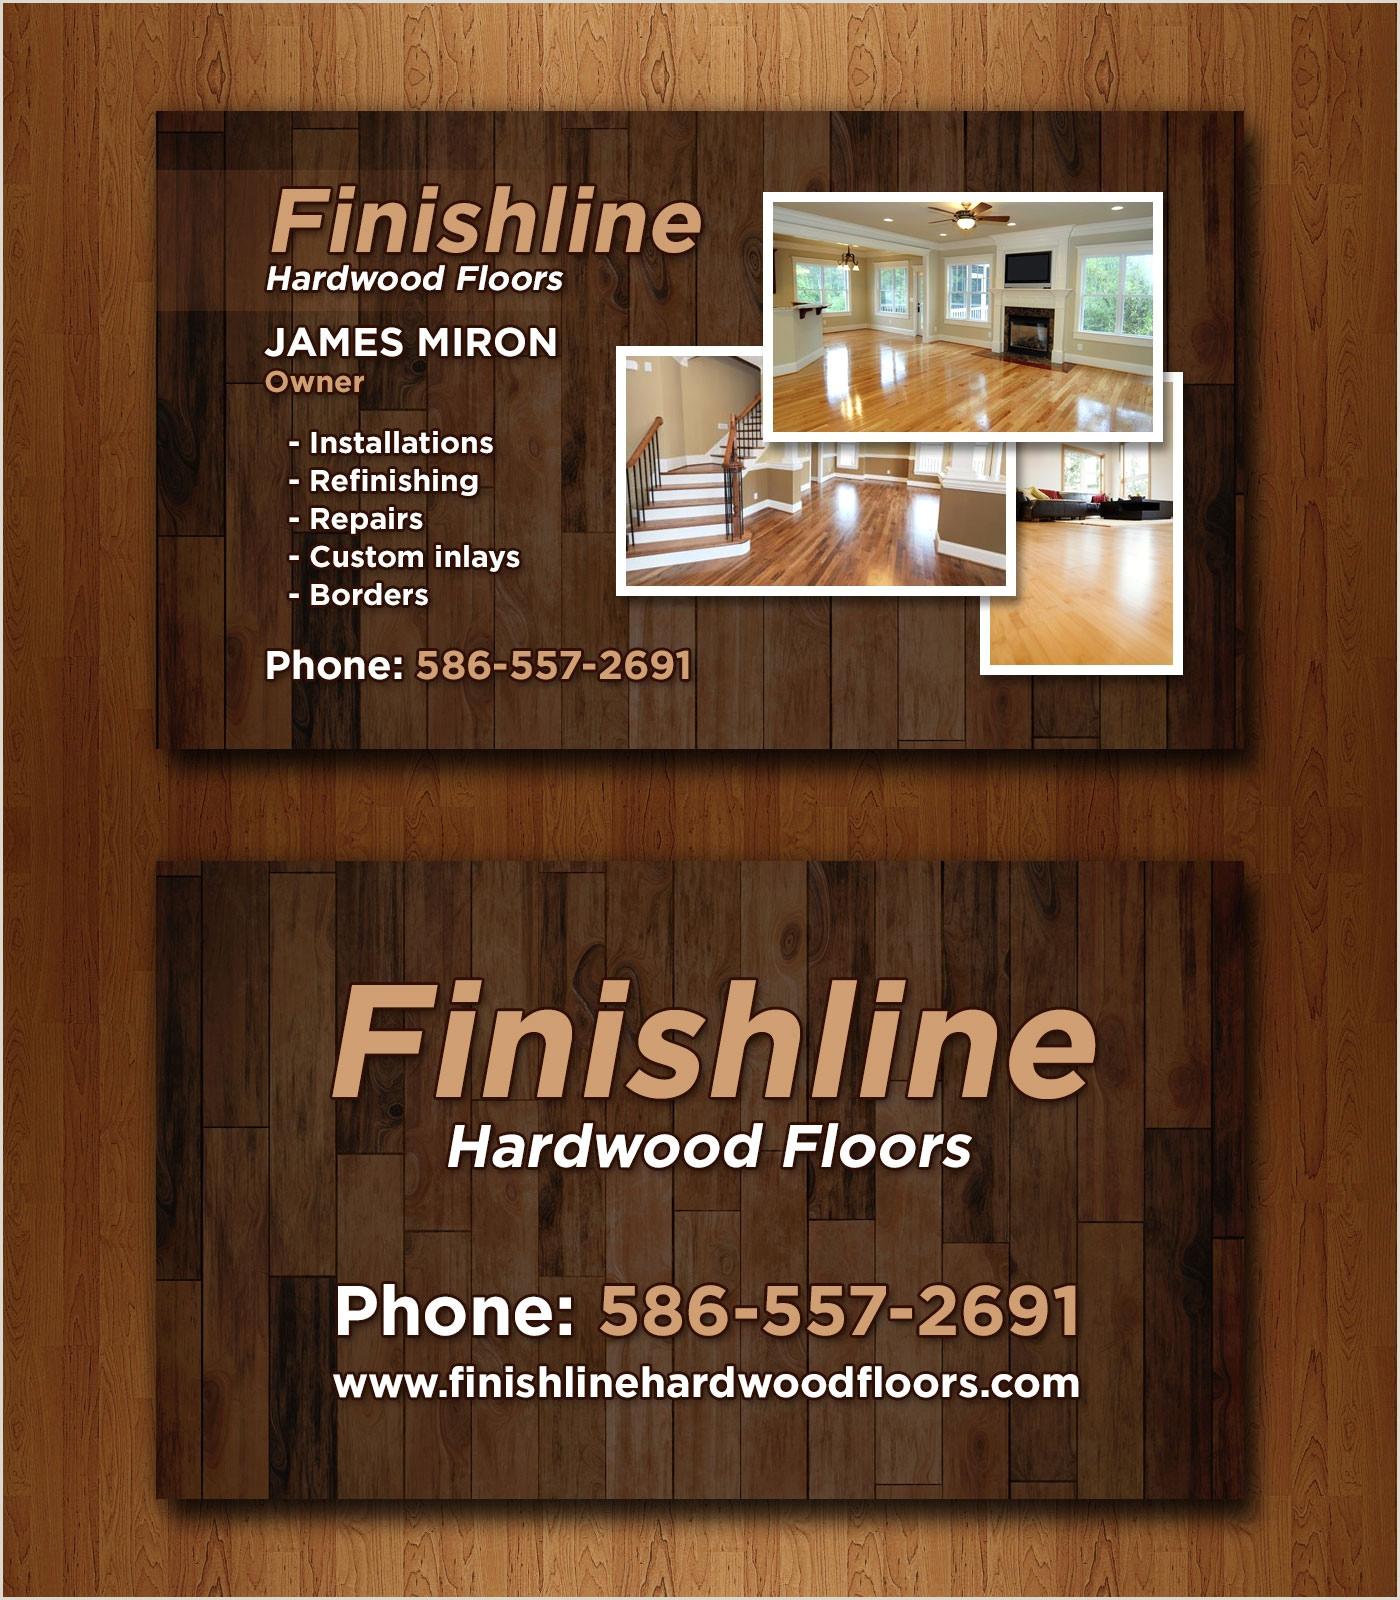 Unique Plastic Business Cards 14 Popular Hardwood Flooring Business Card Template